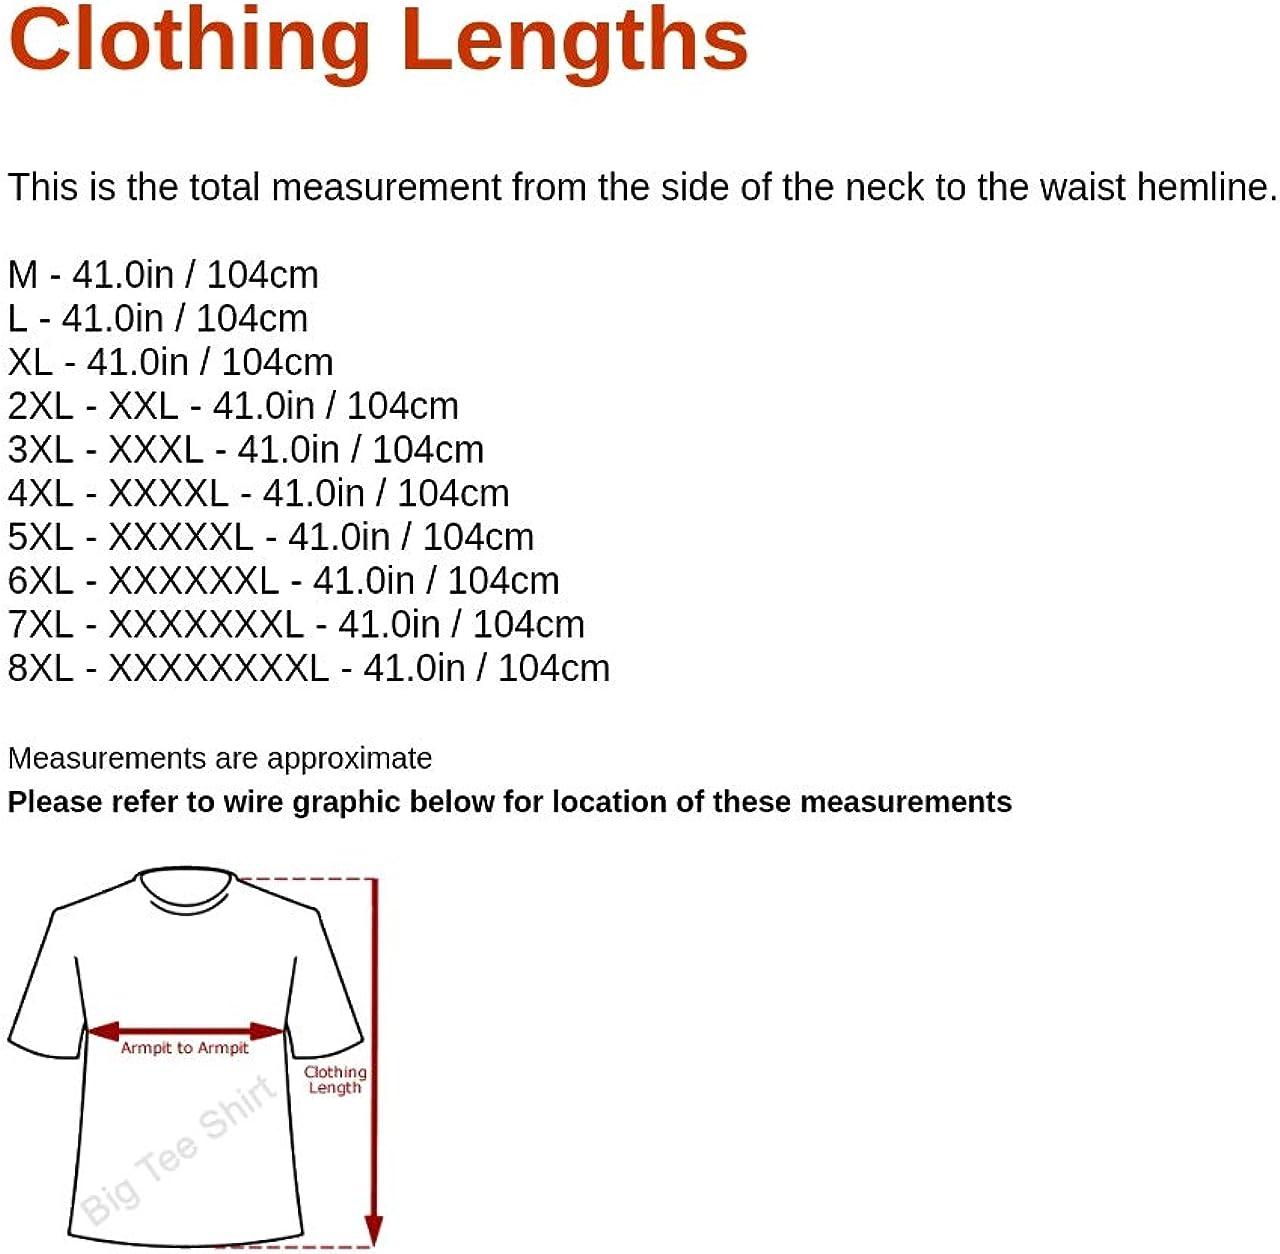 Big Tee Shirt Big Mens Sheepy Nightshirt Large Man Sizes Many Colours L XL 2XL 3XL 4XL 5XL 6XL 7XL 8XL for Big and Tall Men ONLY